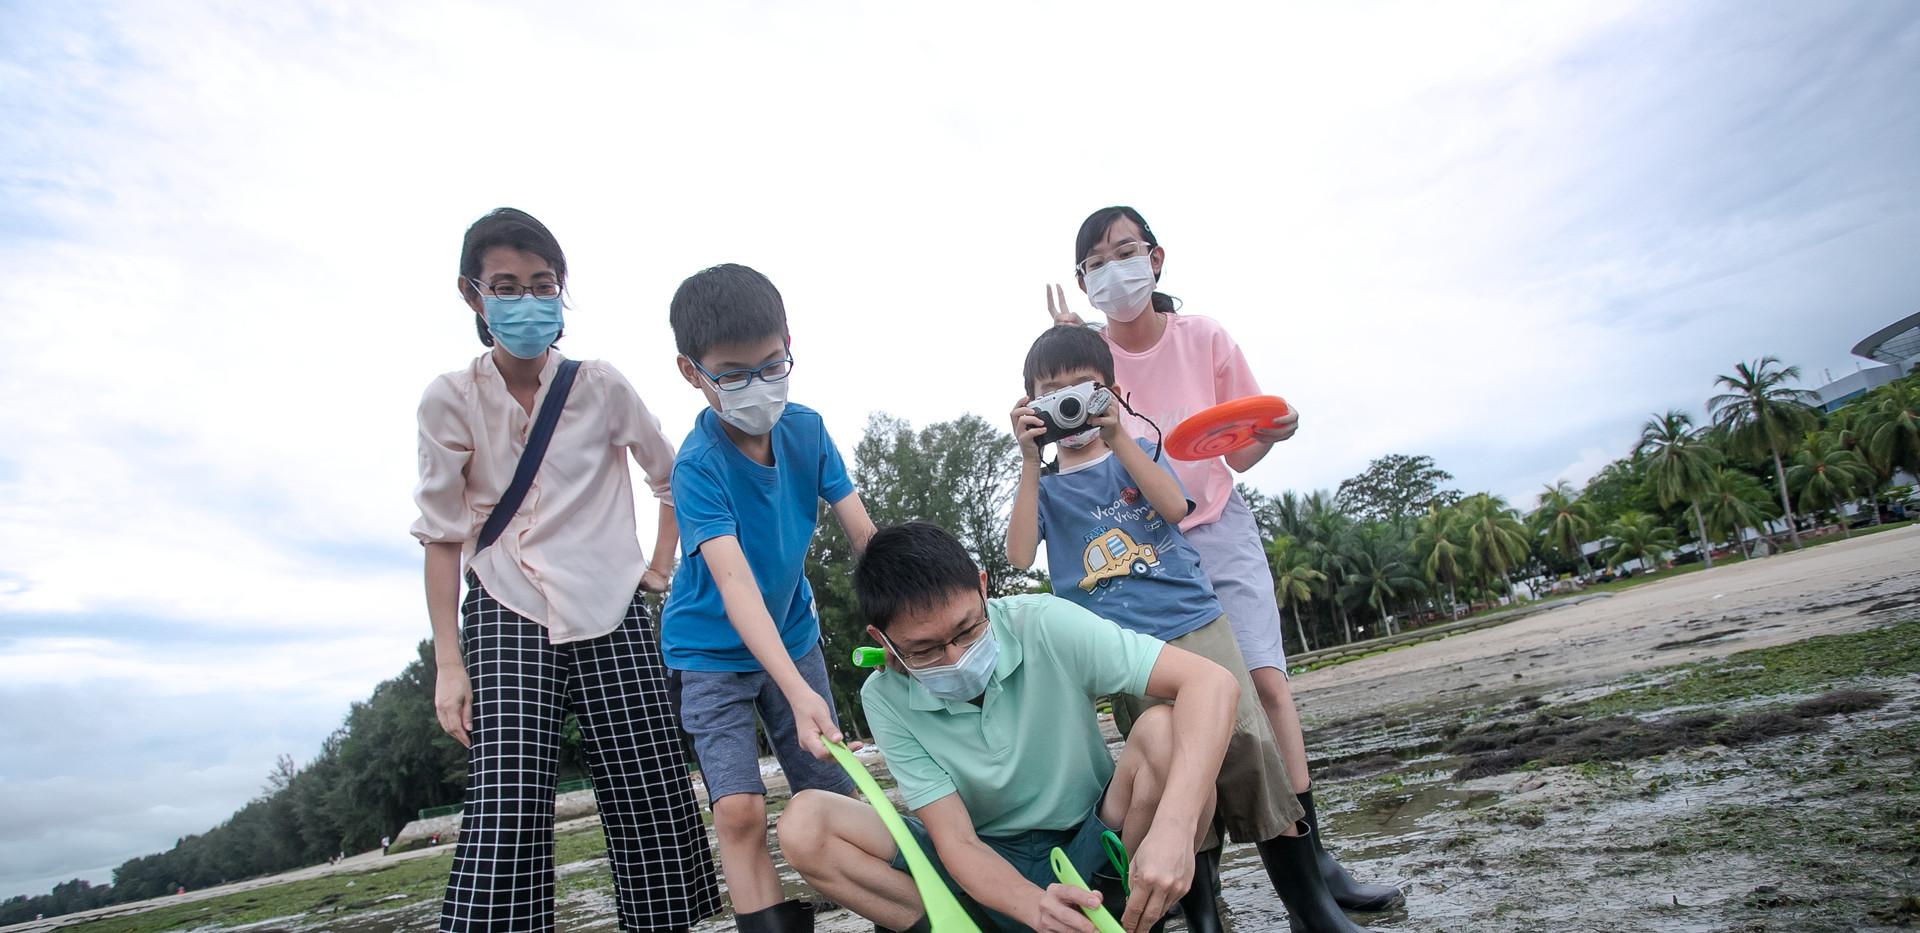 Intertidal Exploration Singapore.jpg